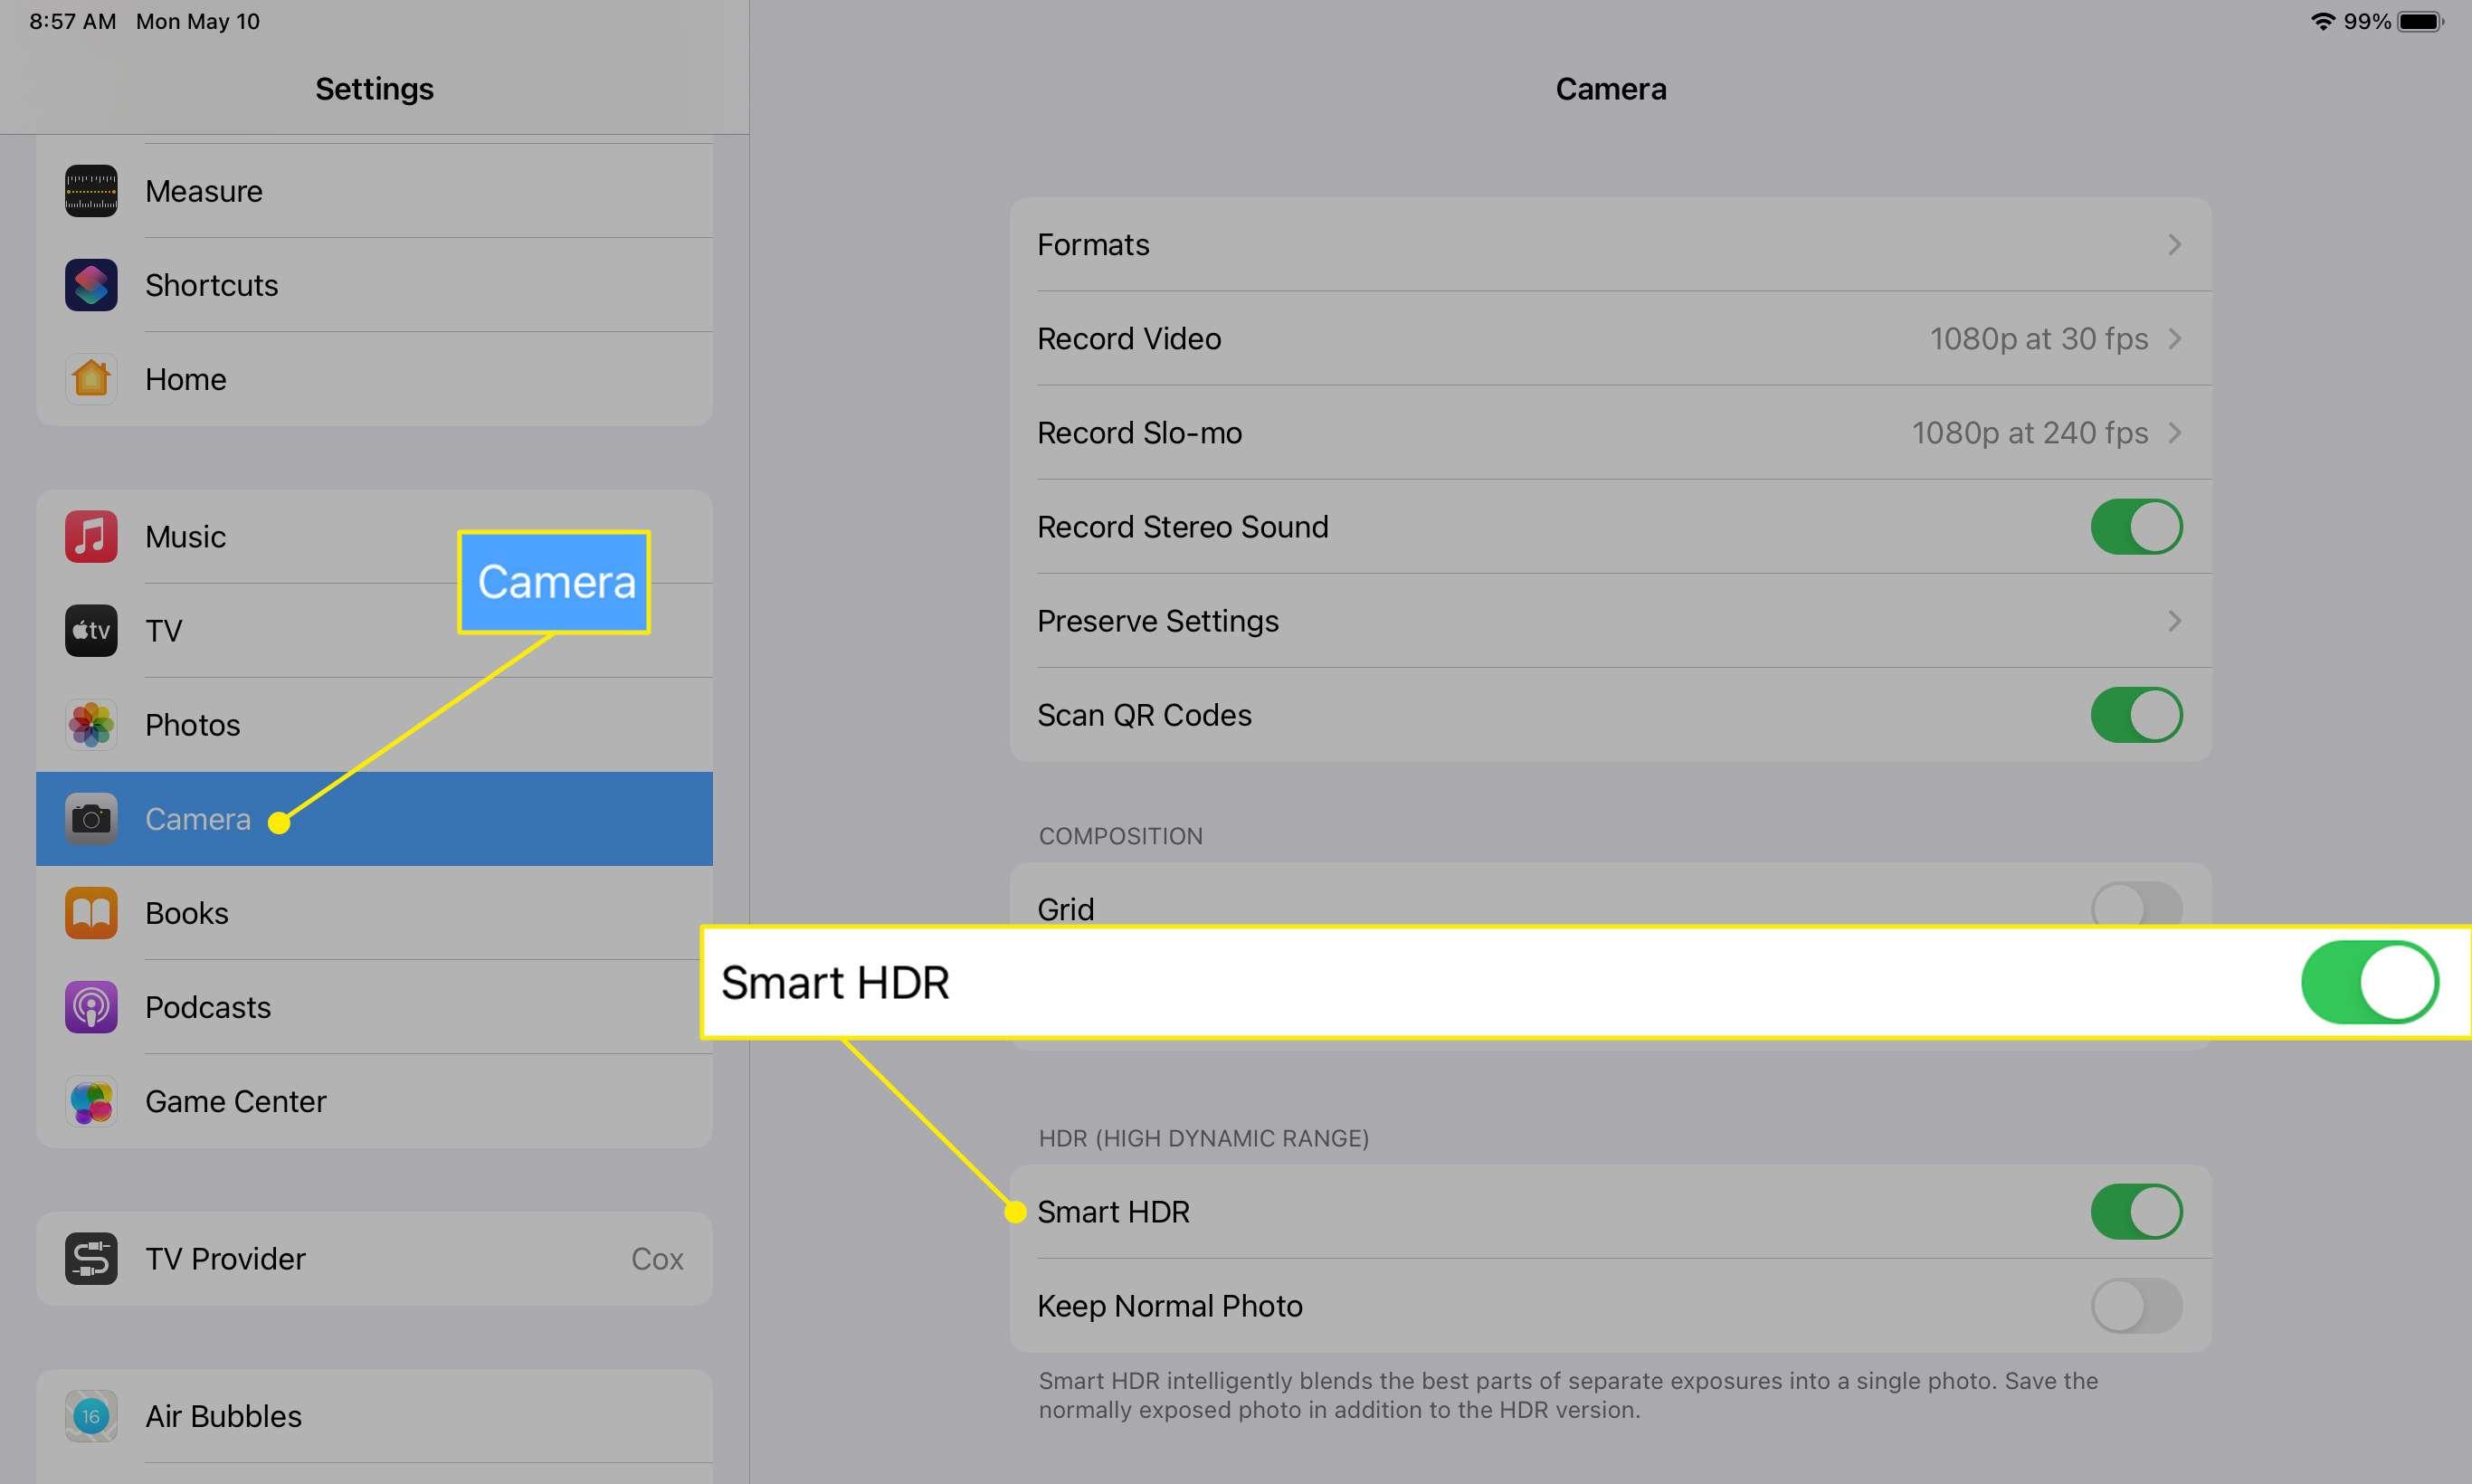 iPad Camera settings showing Smart HDR setting